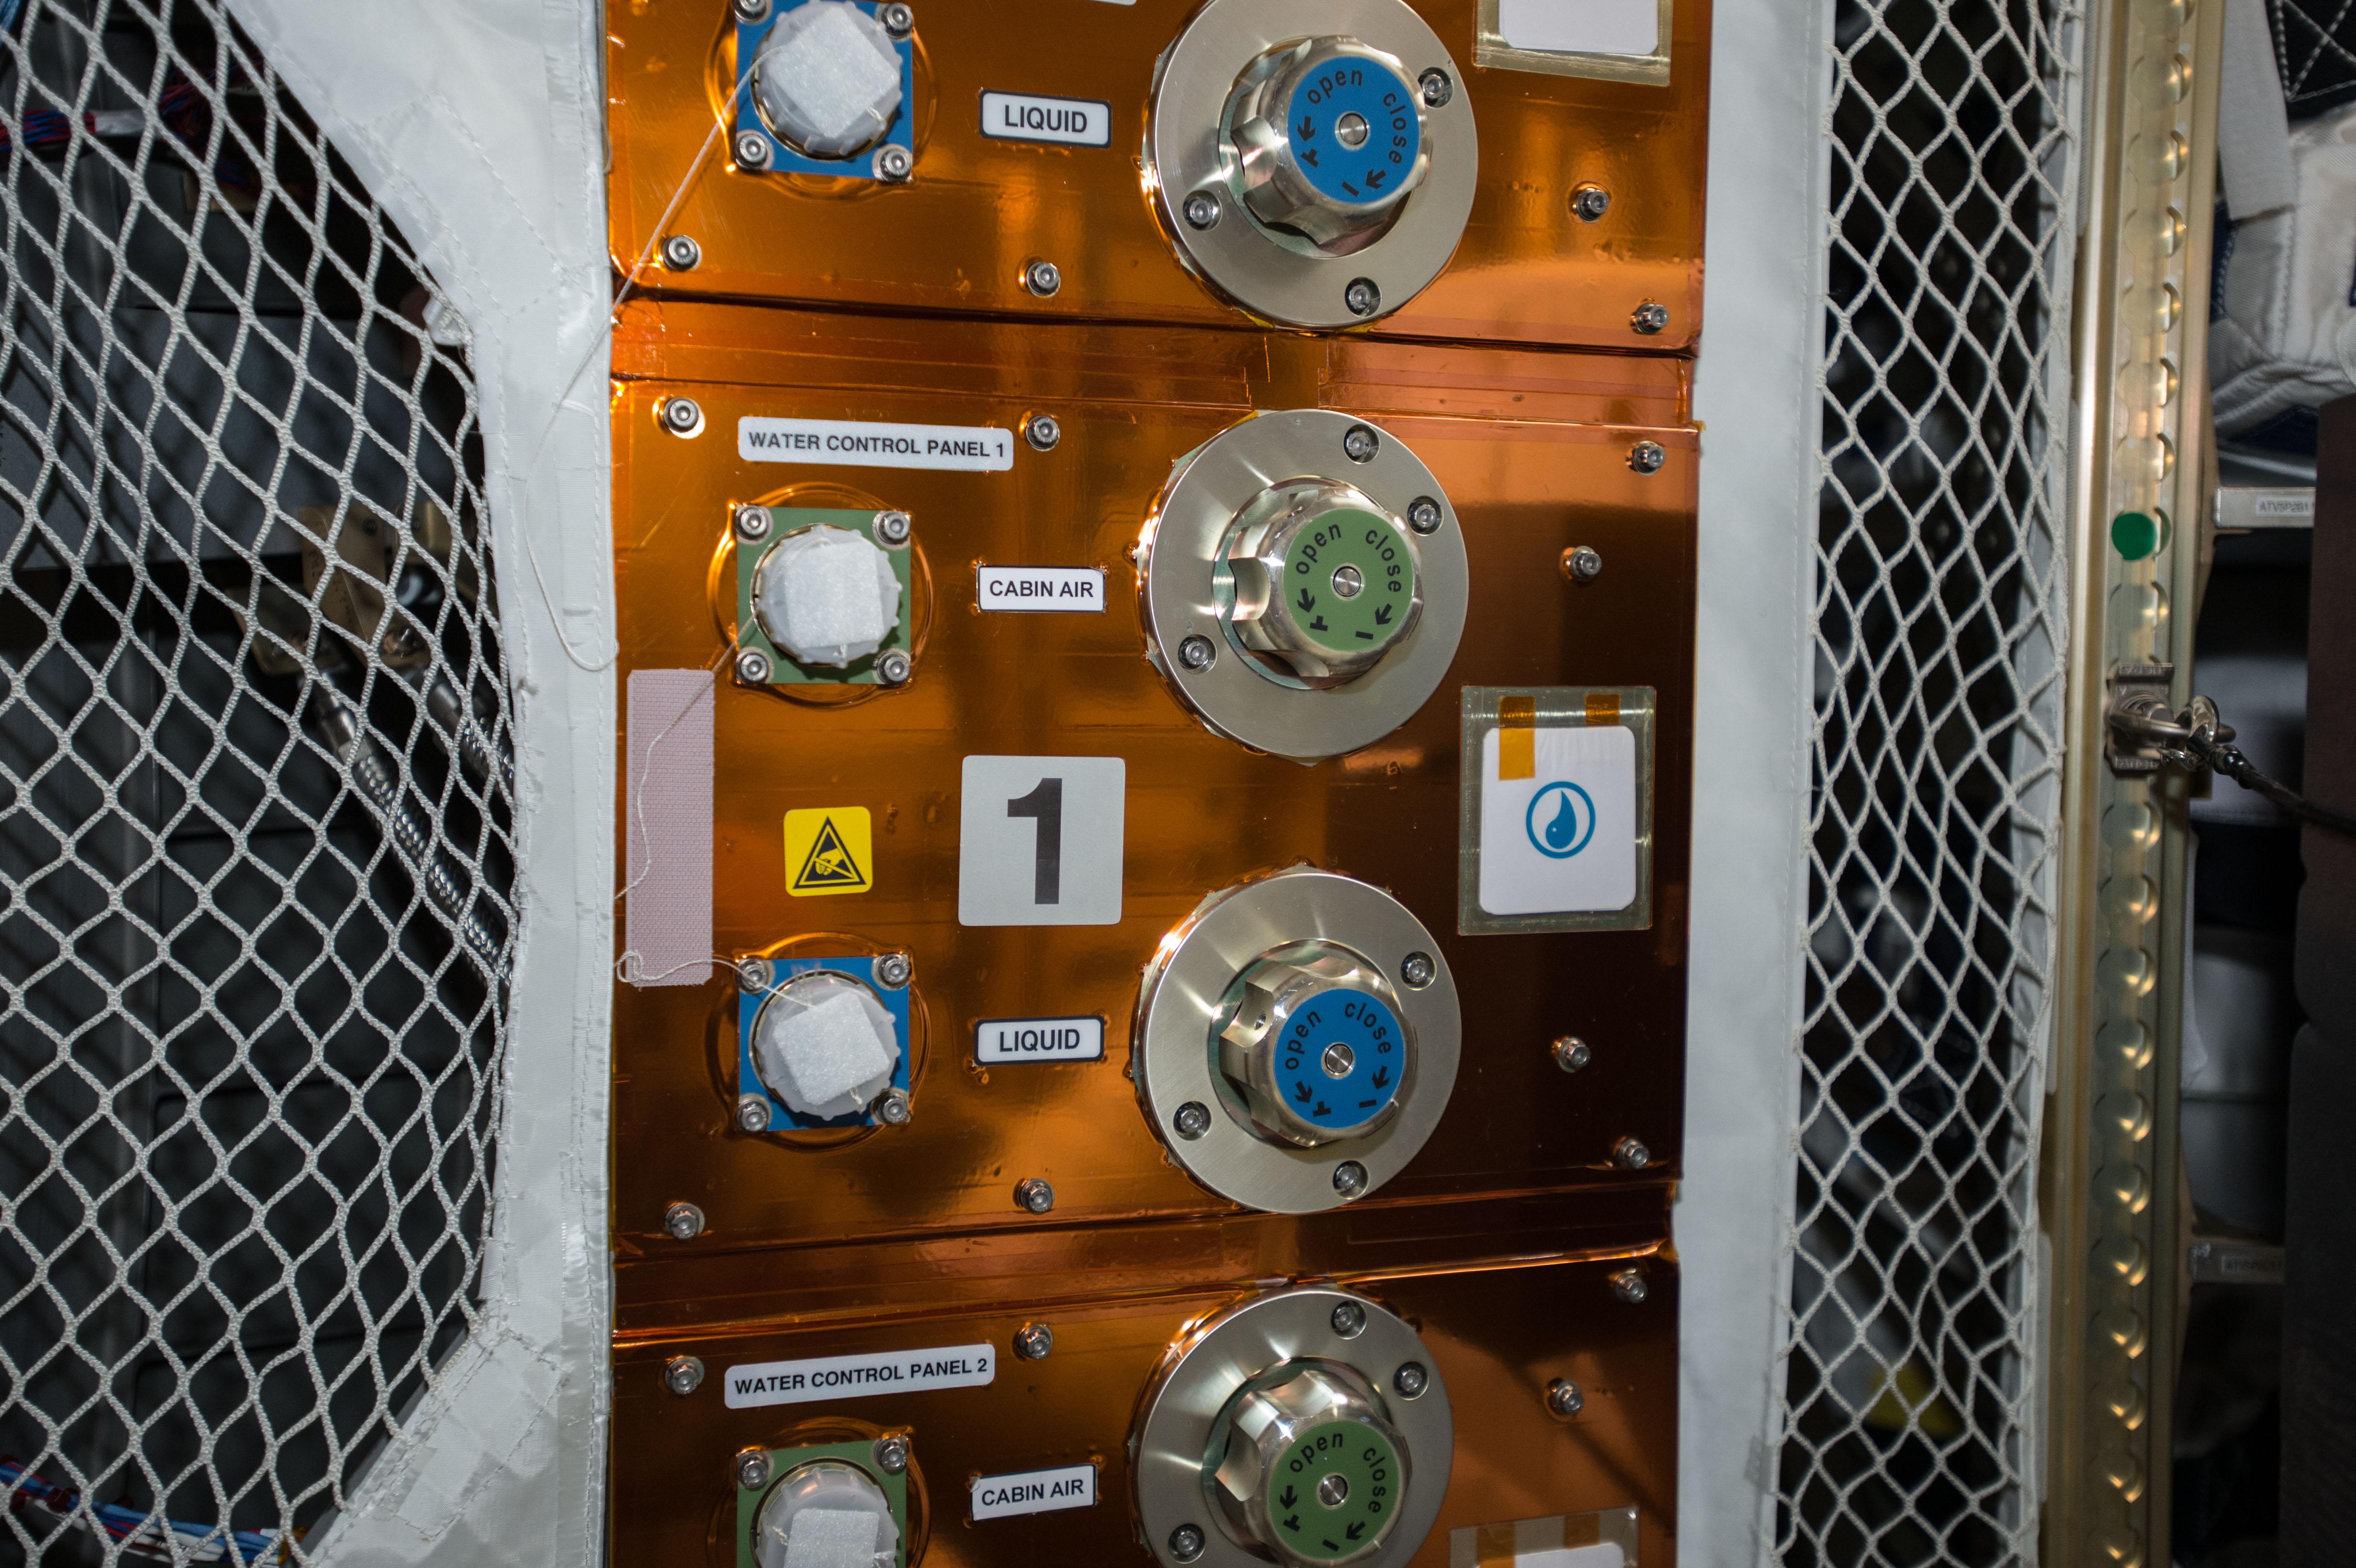 ATV water & gas control panel Credit: ESA/NASA